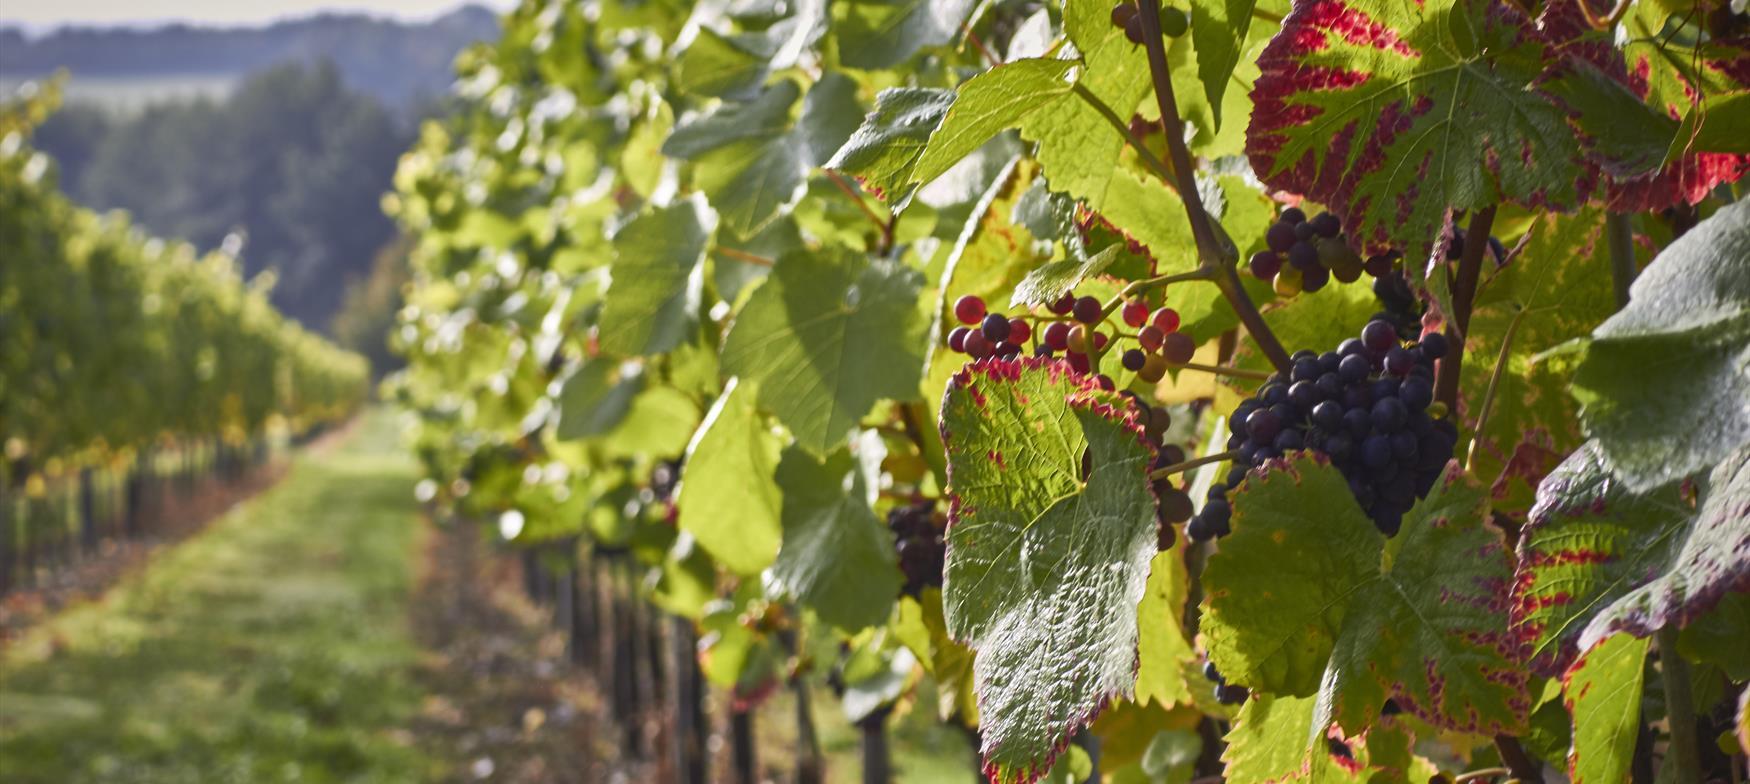 Grape vines growing in England